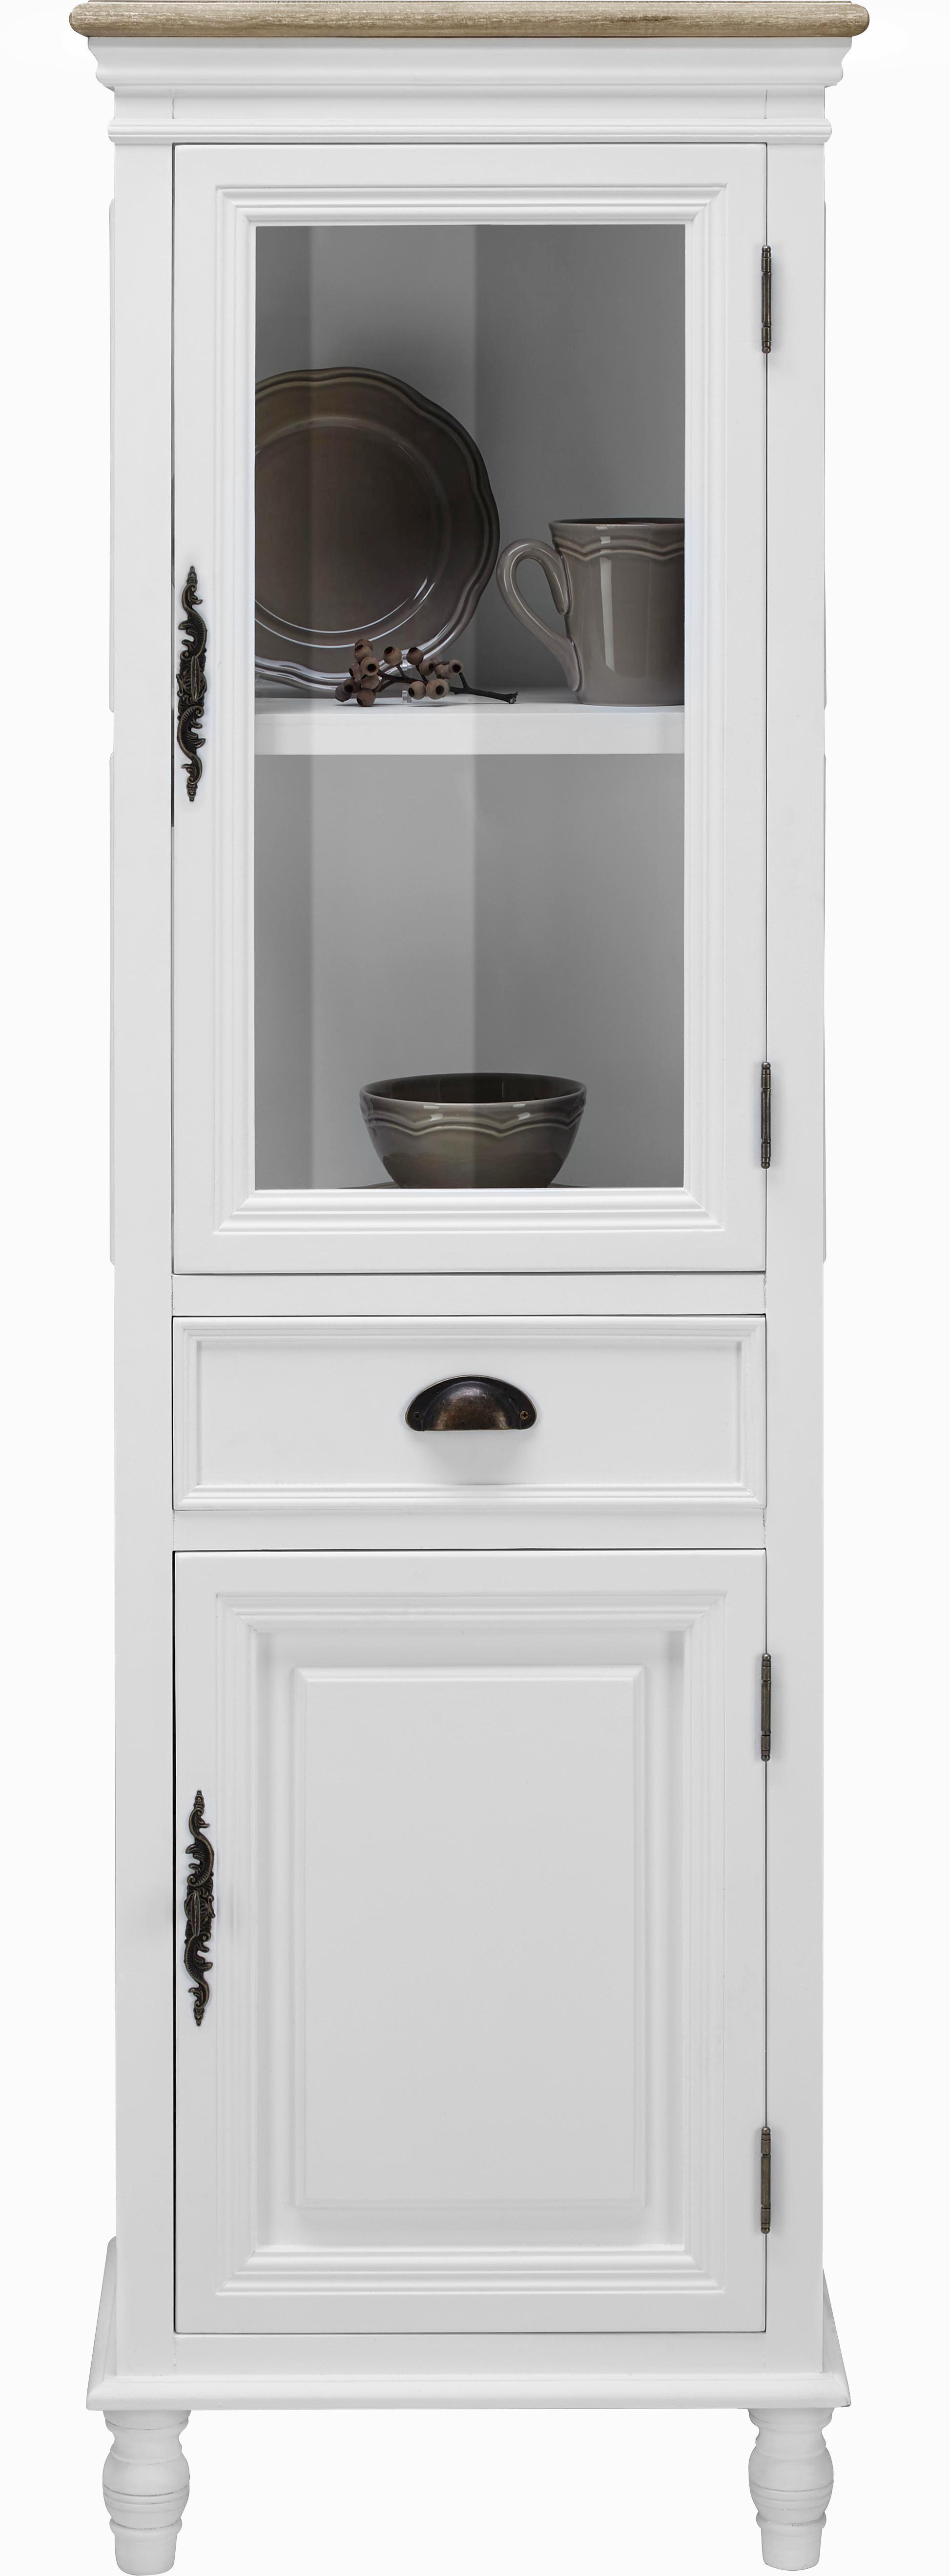 Vitrine Claudia Vintage - Weiß, KONVENTIONELL, Glas/Holz (49/160/32cm) - MÖMAX modern living